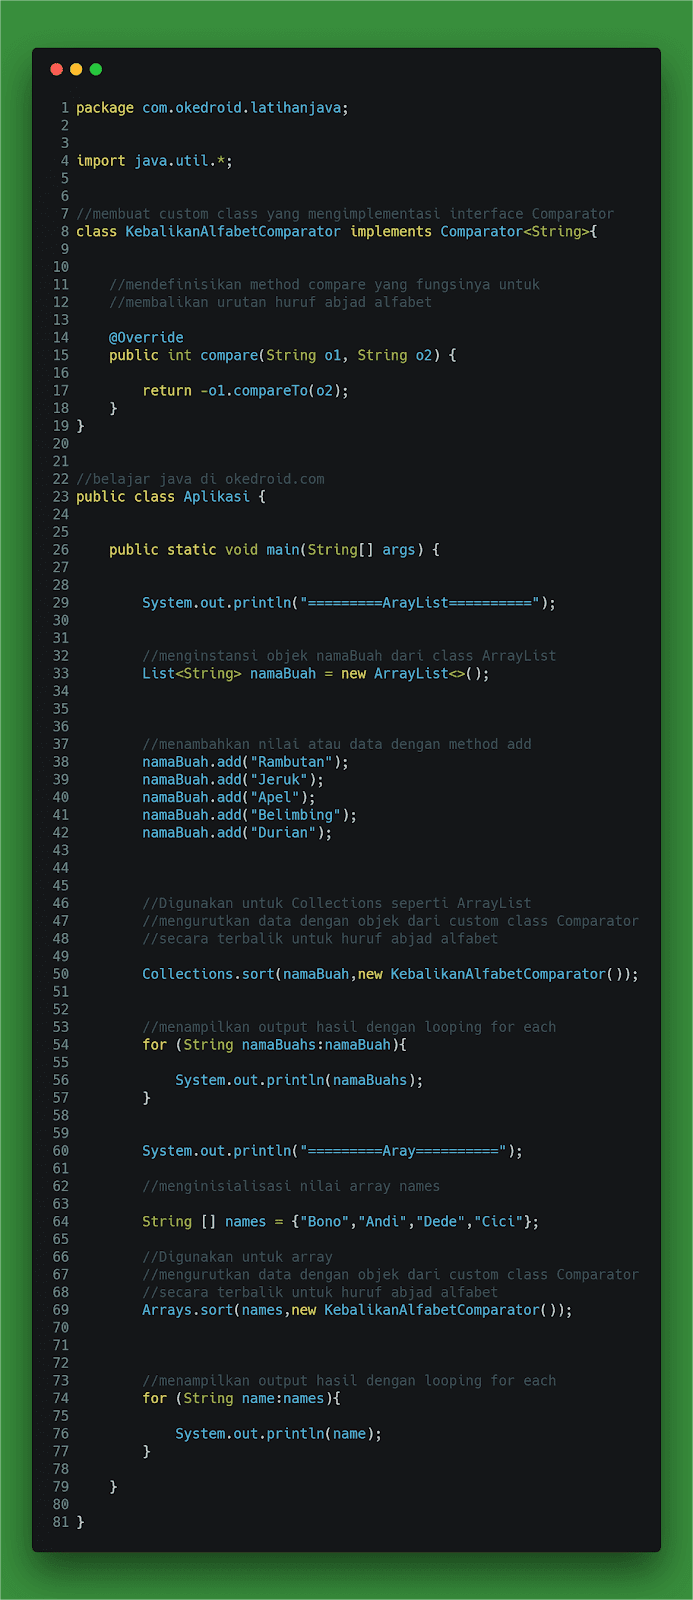 Contoh Code program mengurutkan huruf text string terbalik kebalikan dengan interface comparator di program java